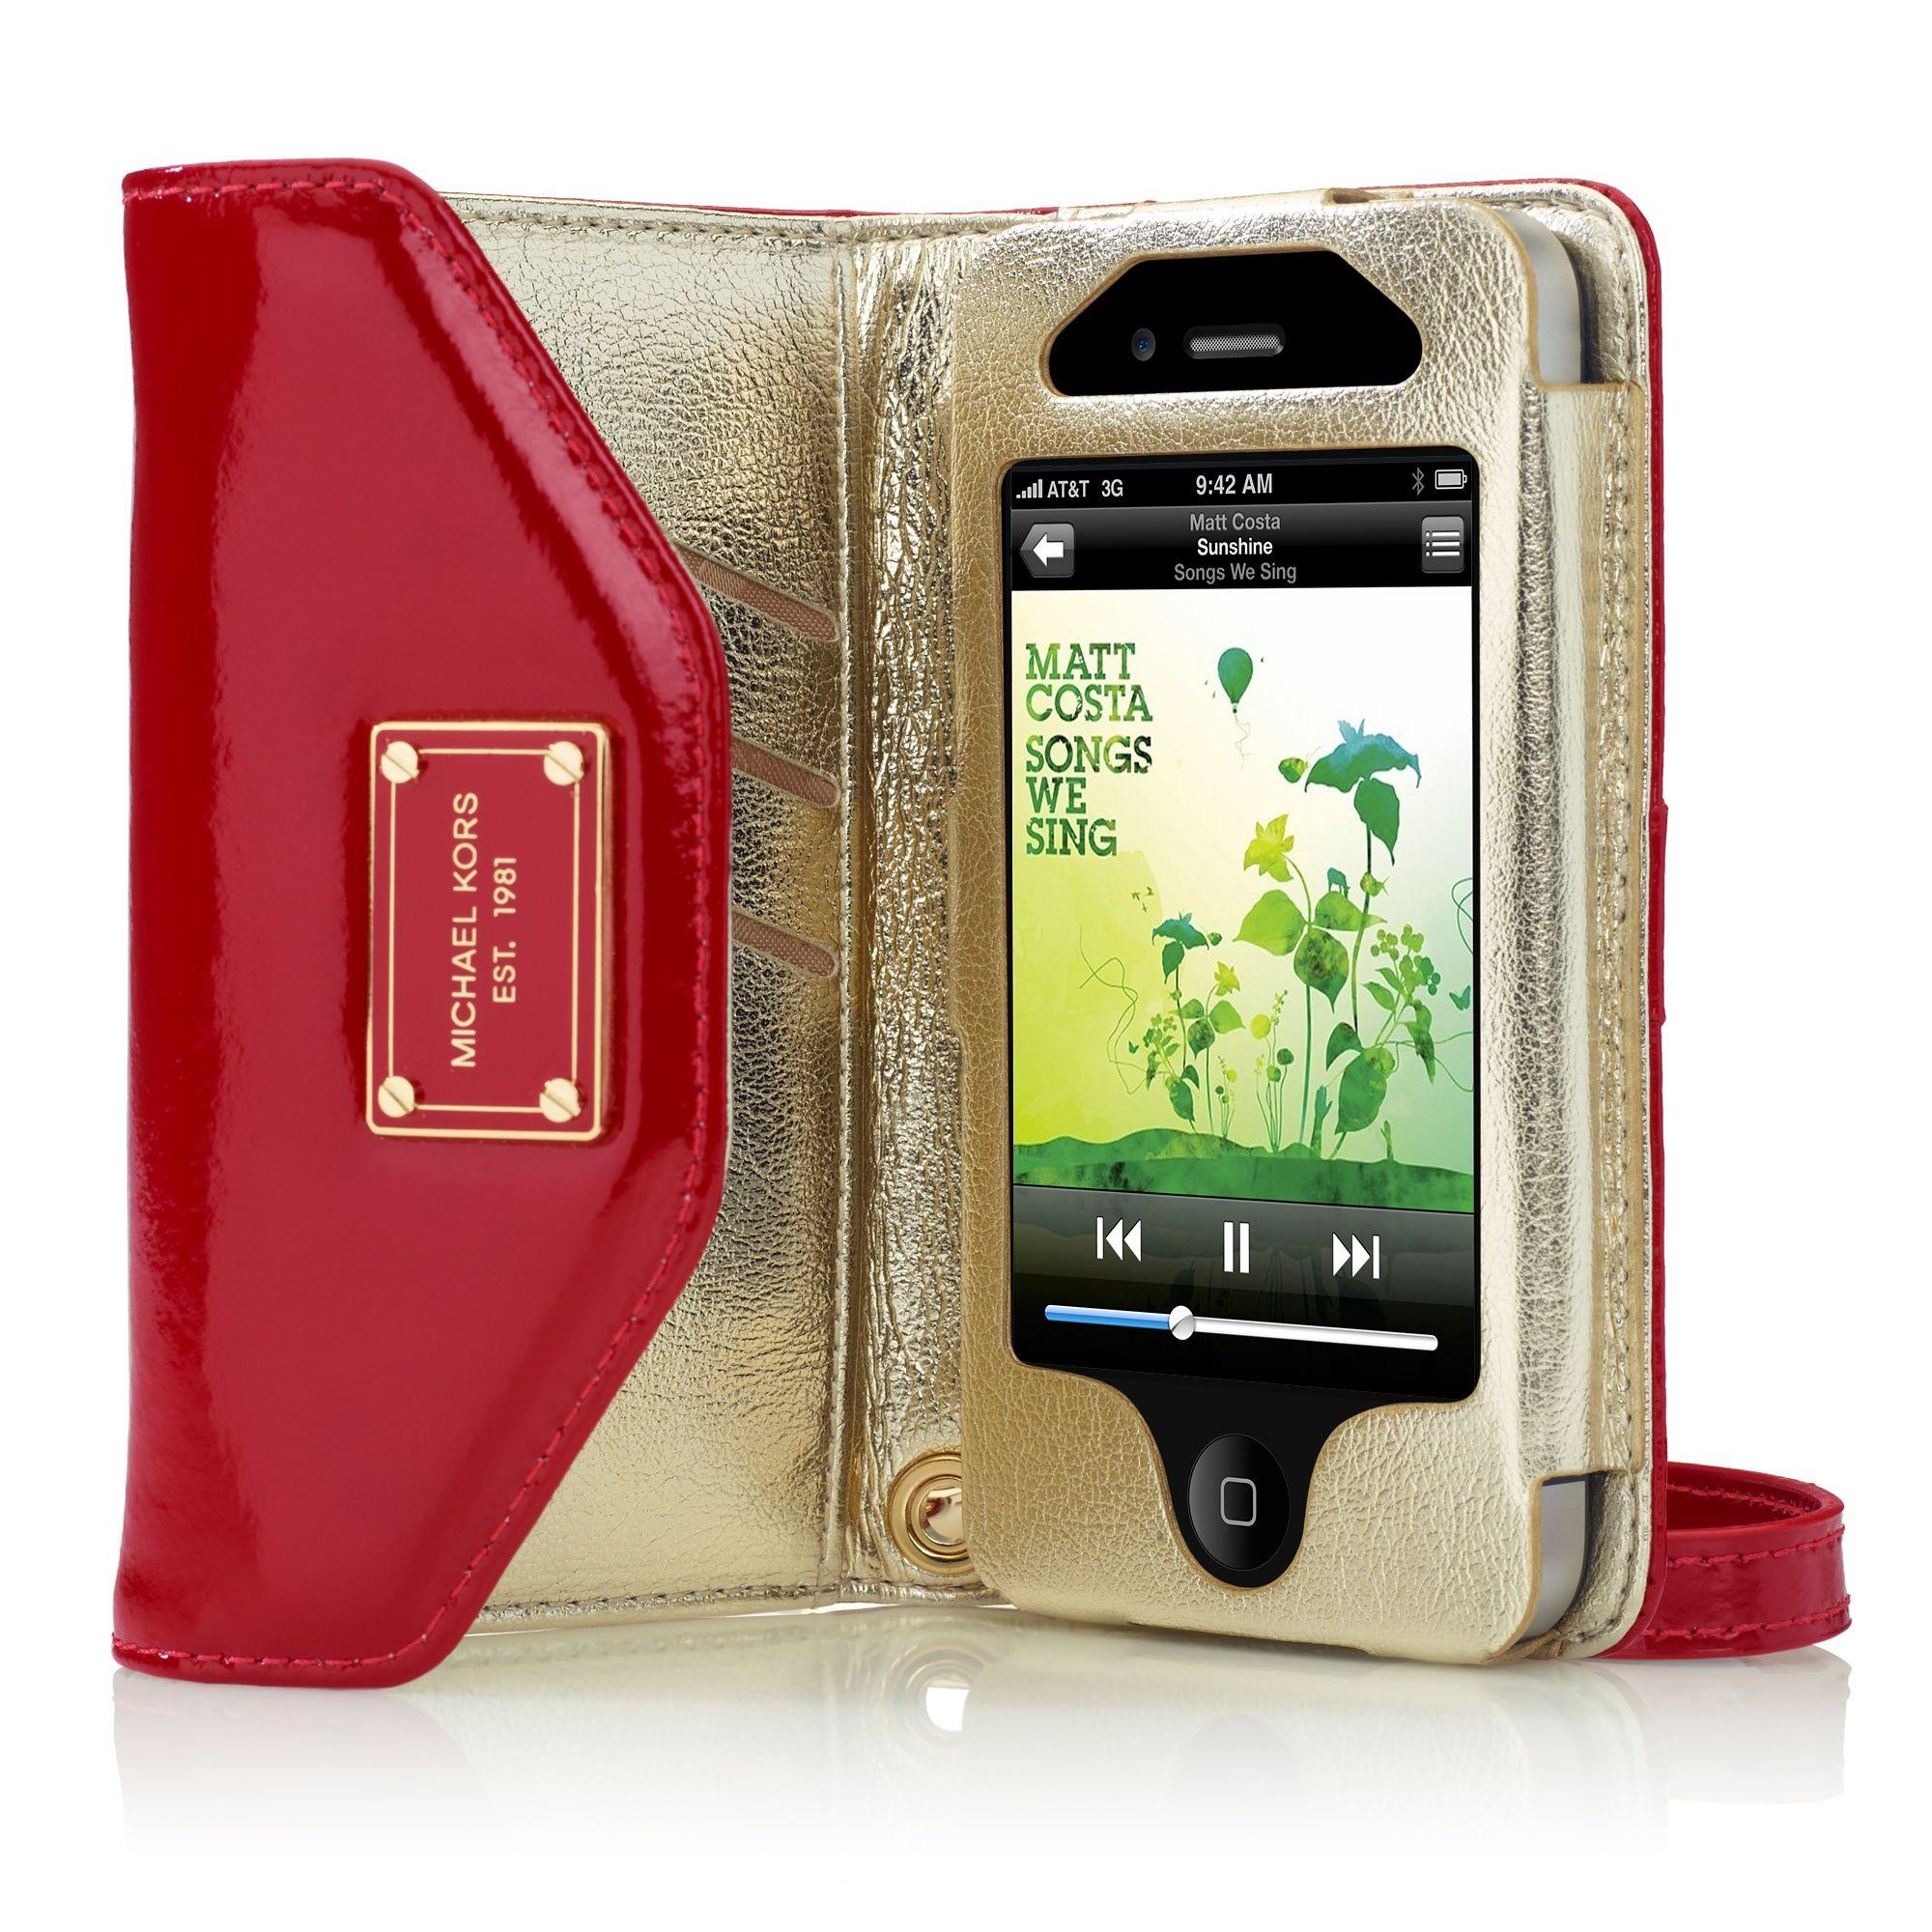 Michael Kors Wallet Clutch for iPhone 4